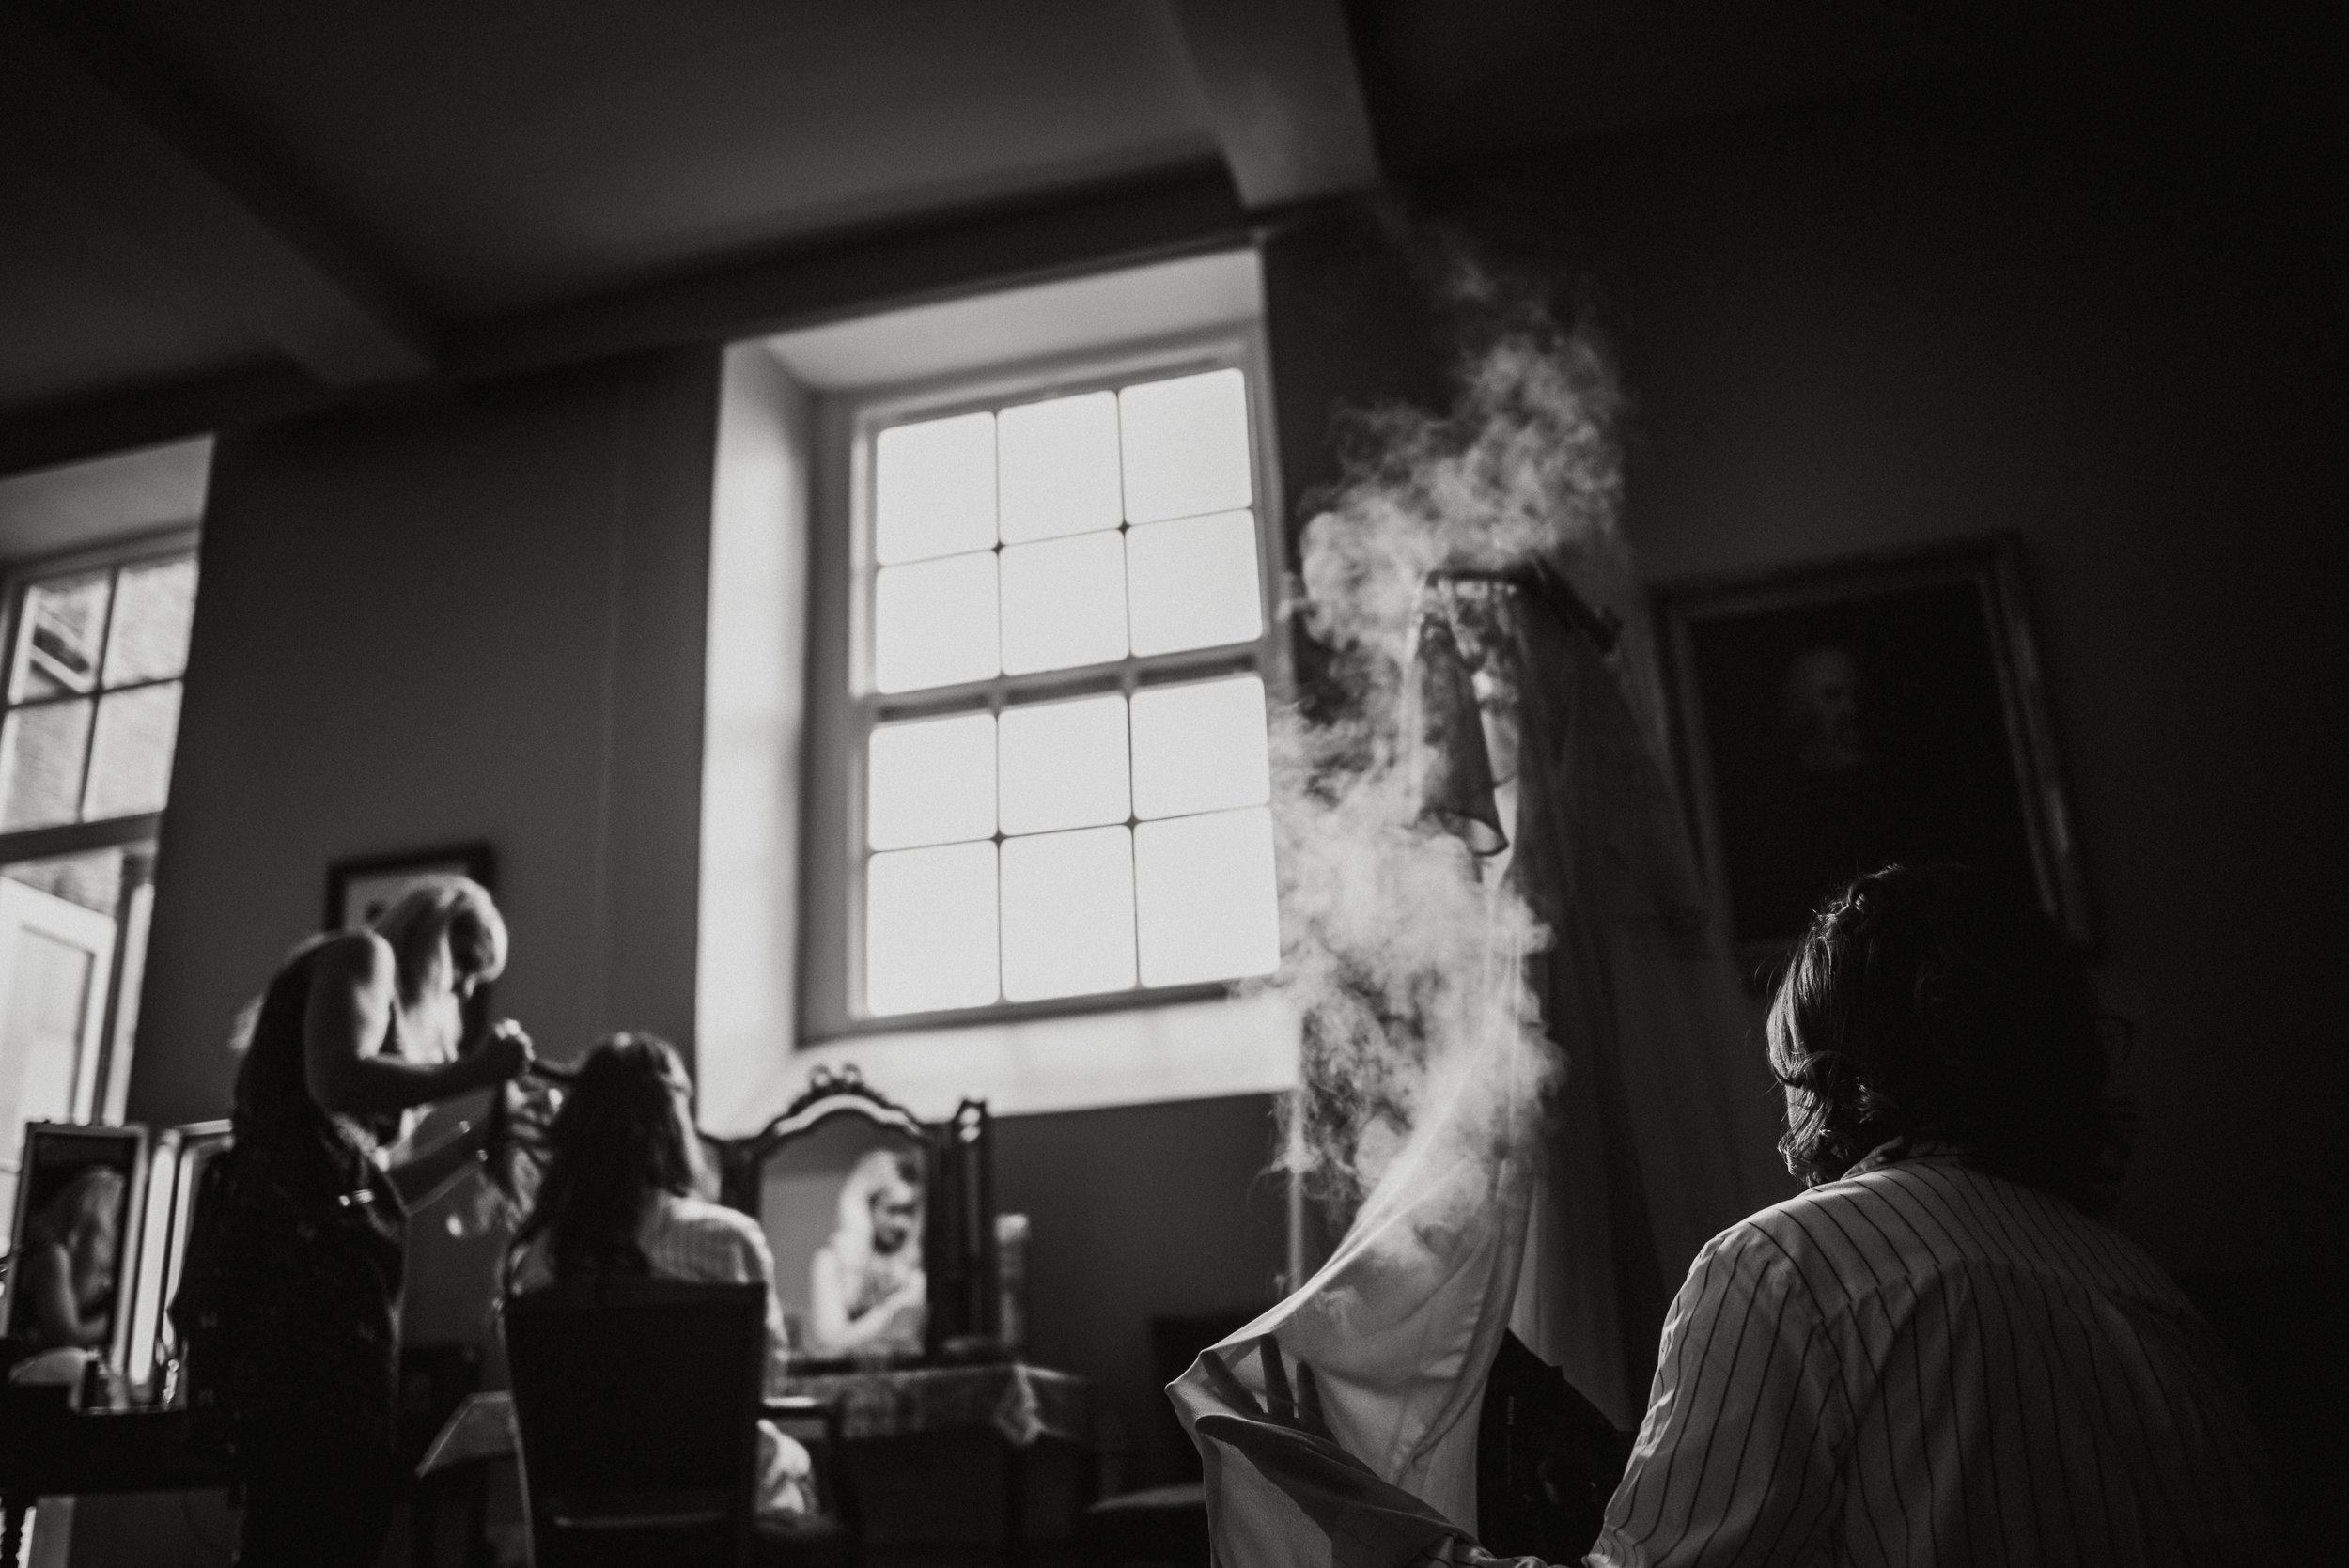 pencarrow-house-wedding-photographer-12.jpg